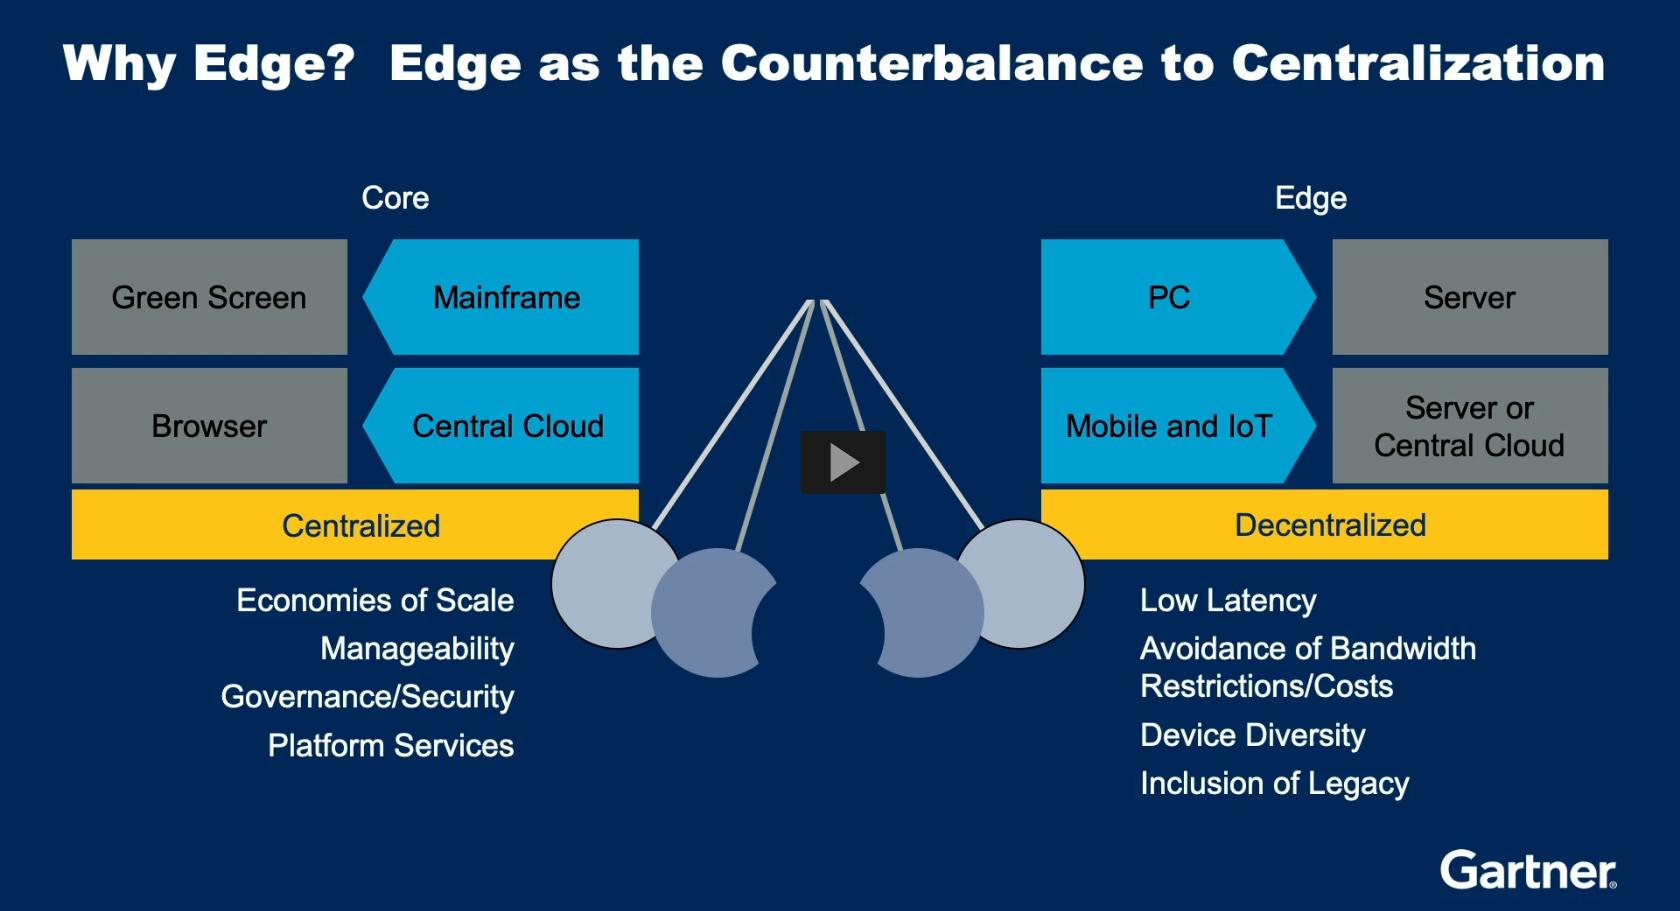 https://www.ibm.com/cloud/what-is-edge-computing